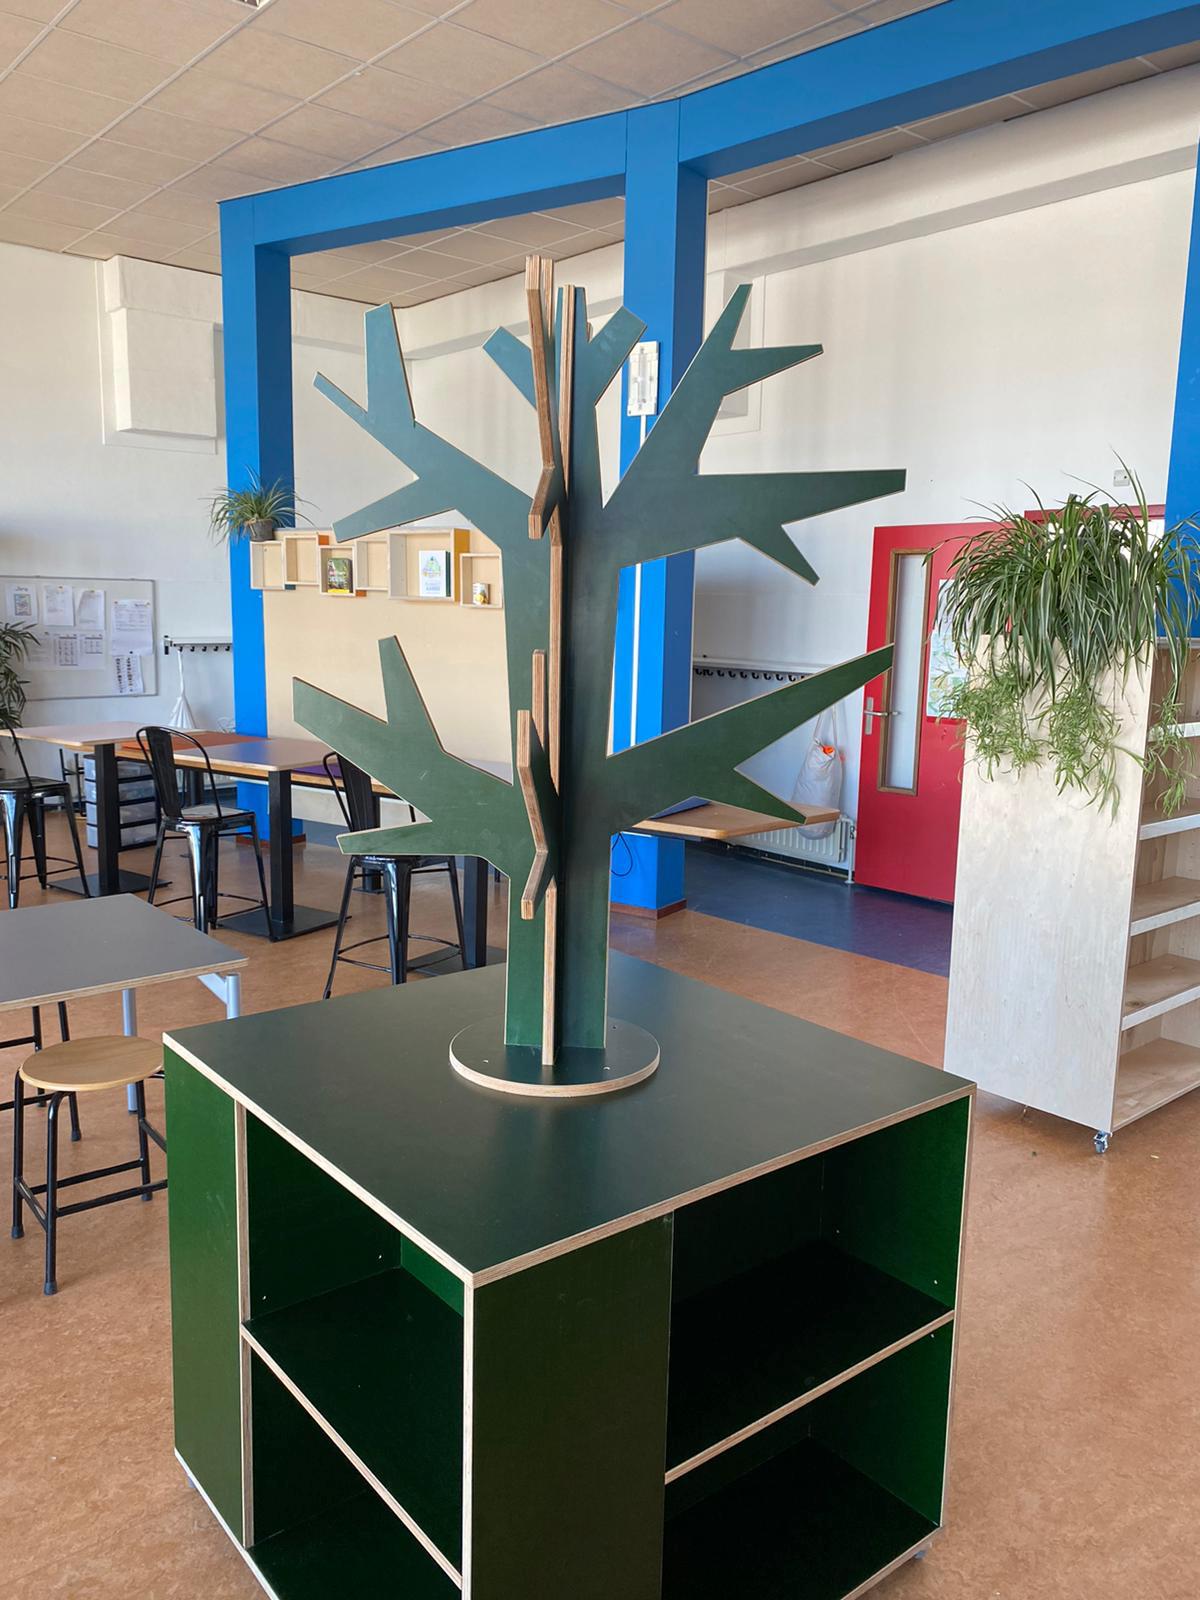 Interieur basisschool de Parel